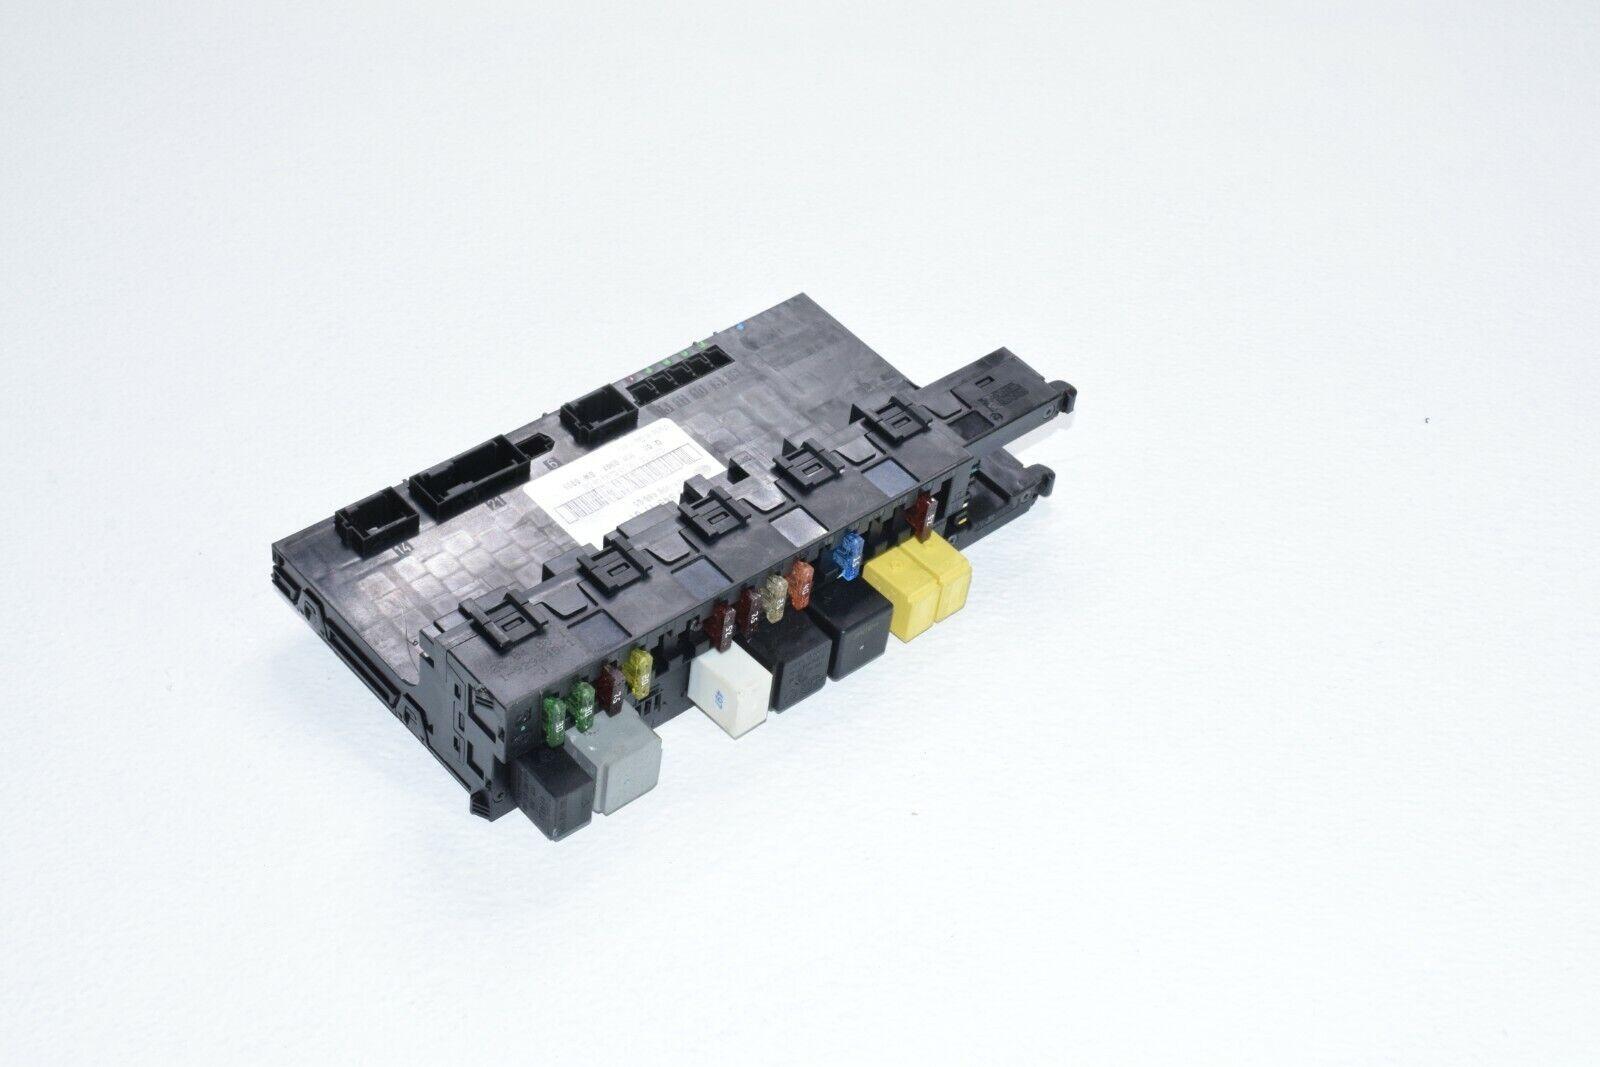 mercedes benz clk 350 500 550 63 rear trunk sam fuse box relay panel unit  oem   ebay  ebay